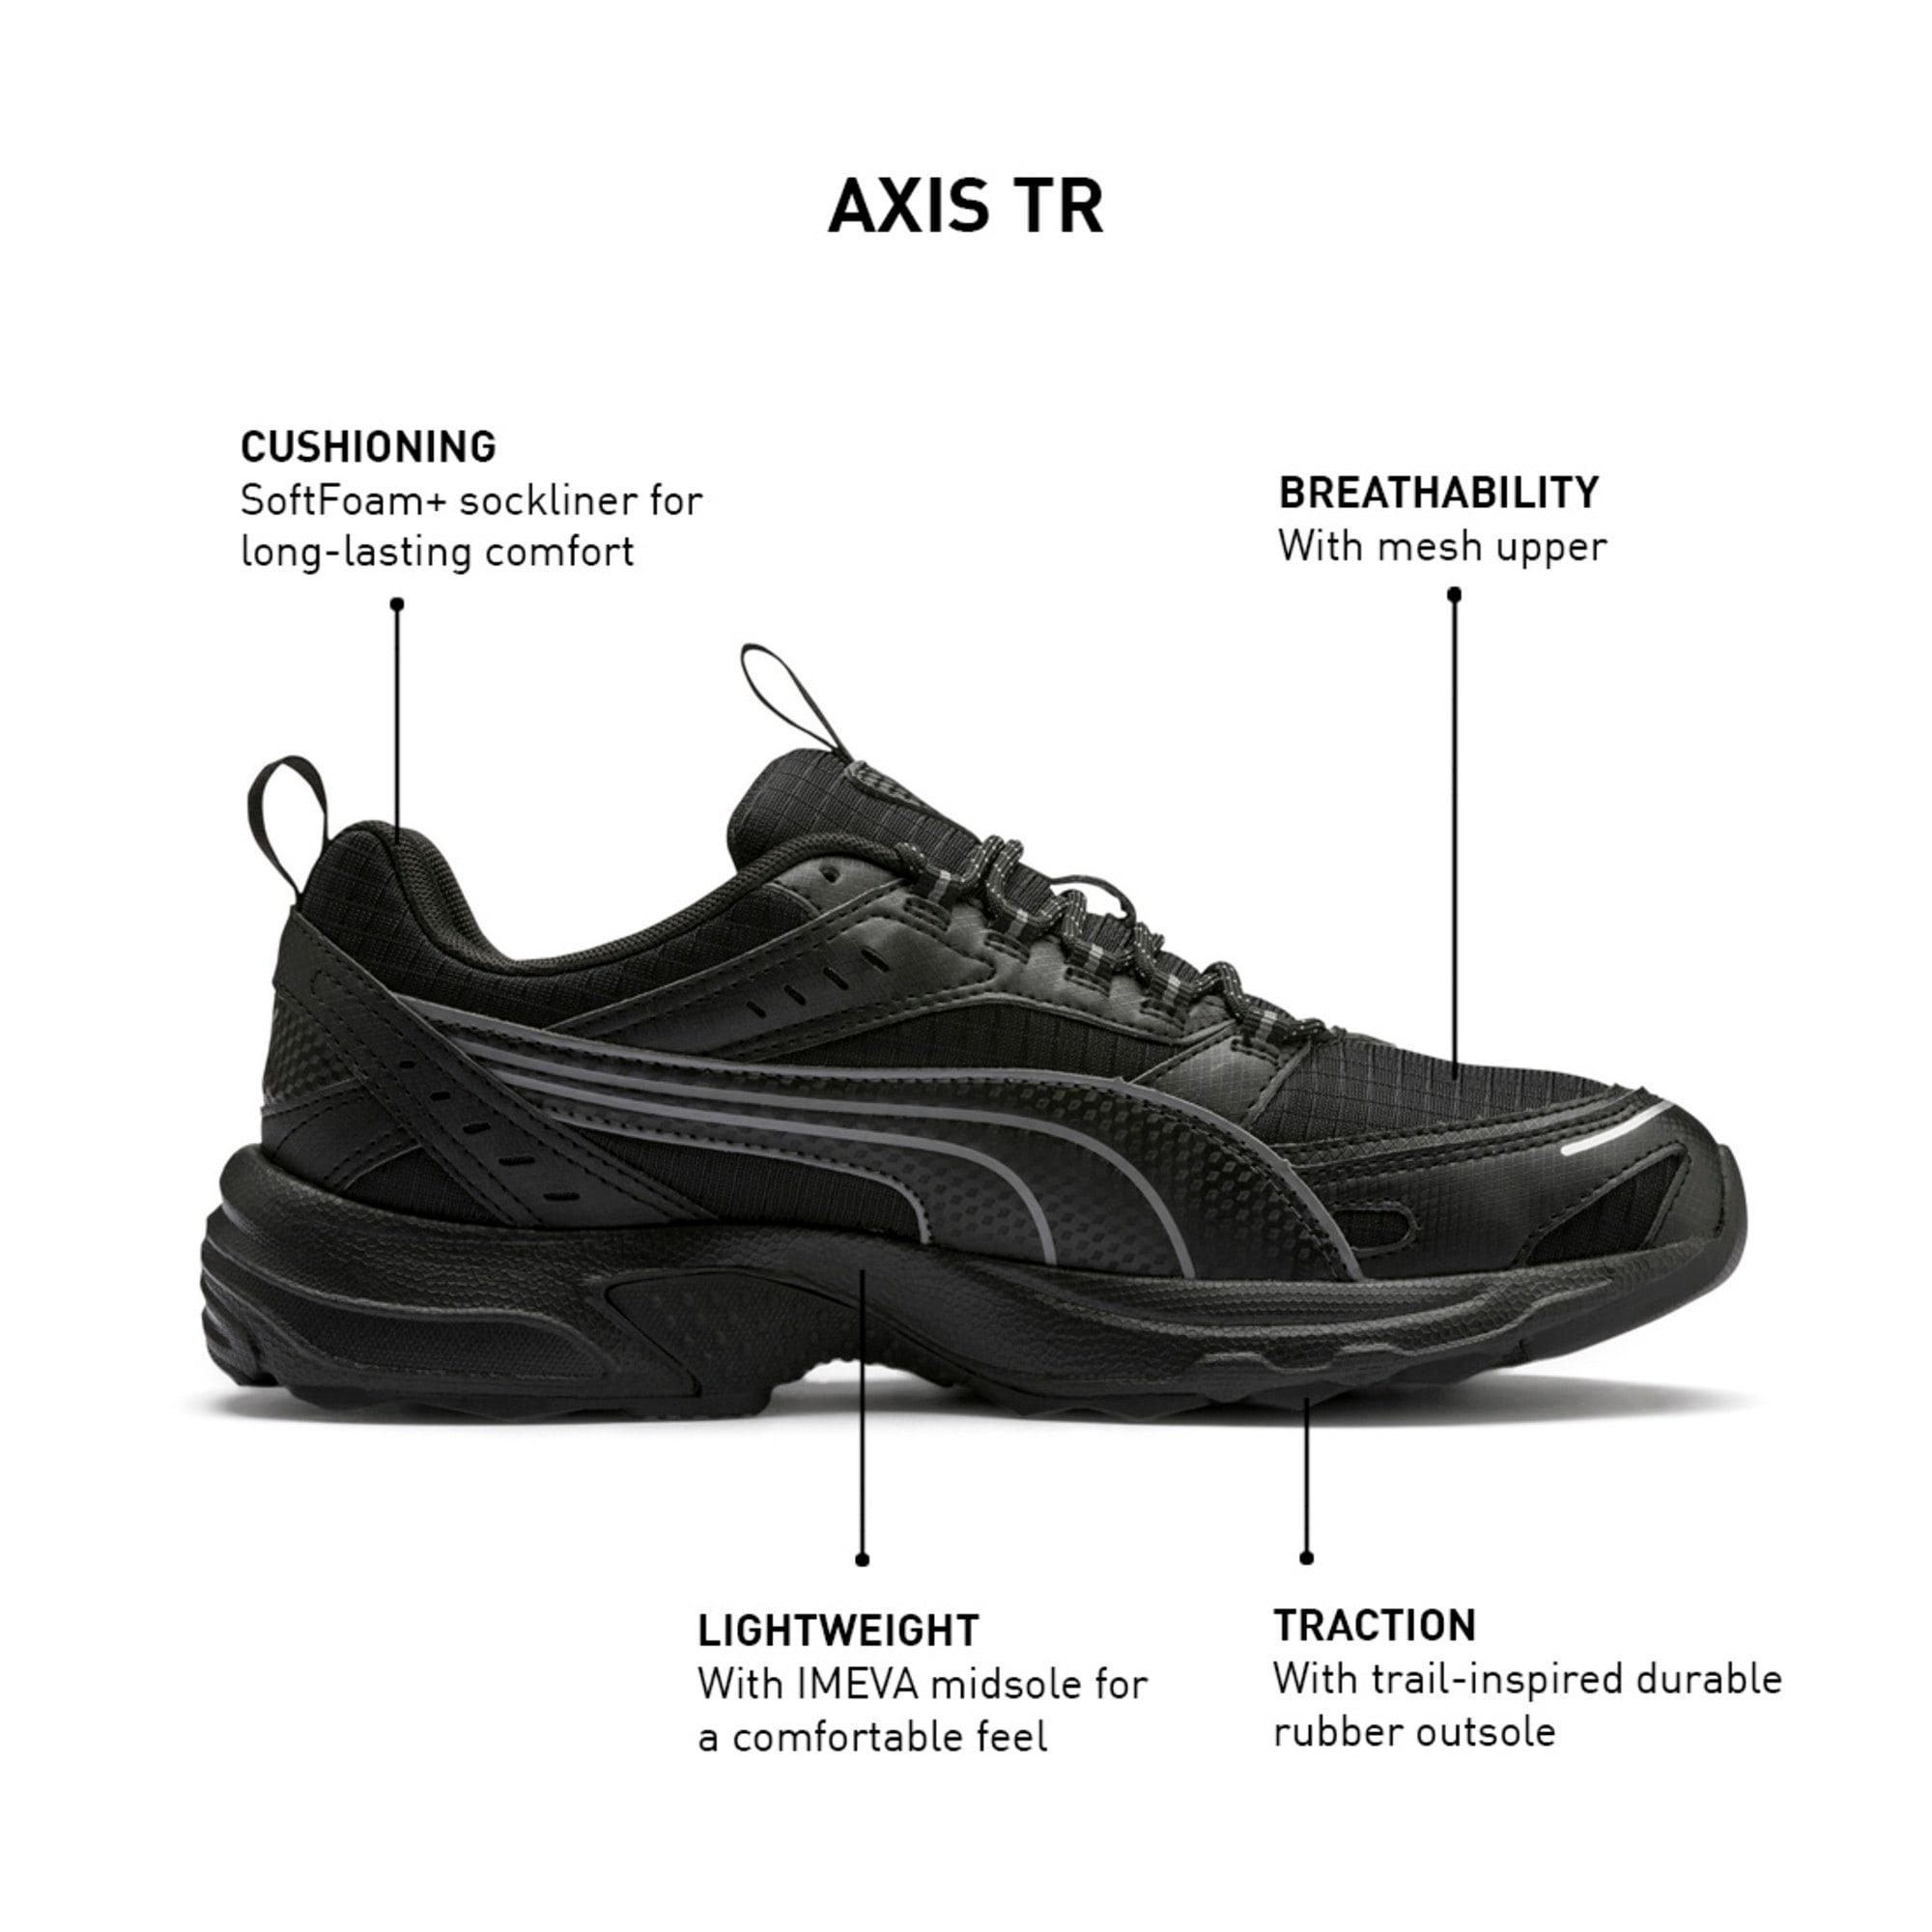 Thumbnail 9 of Axis Training Trainers, Puma Black-CASTLEROCK-Silver, medium-IND